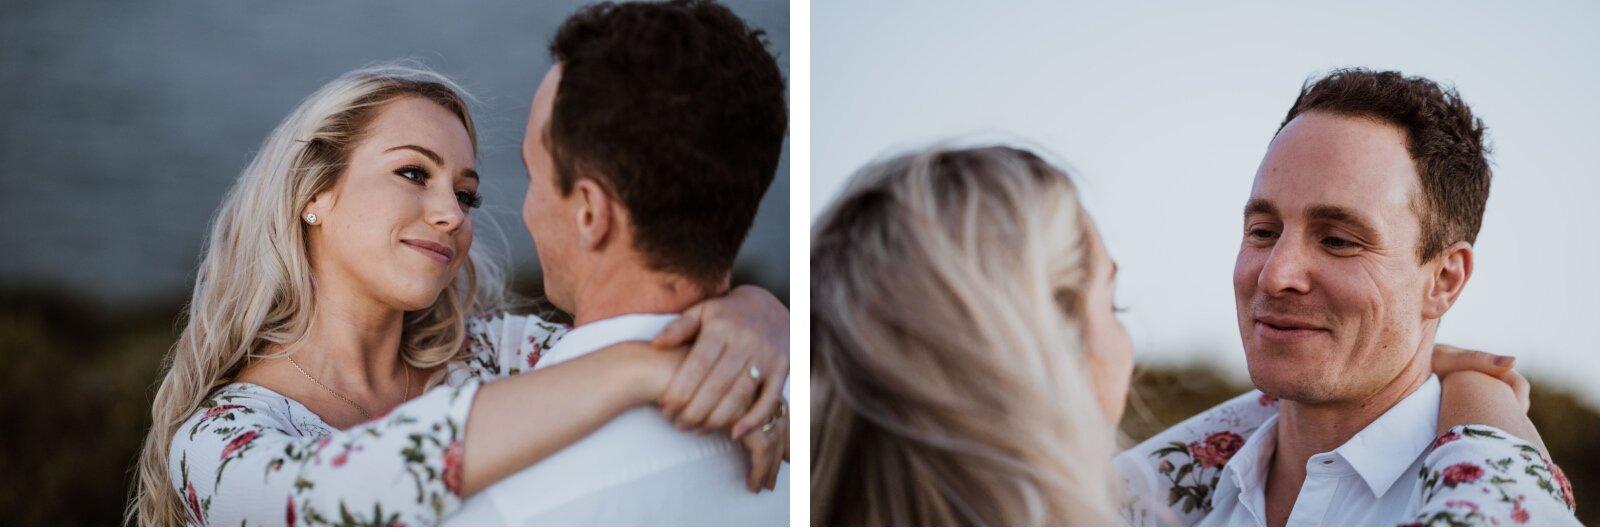 newcastle-wedding-photographer-dudley-engagement-shoot-32.jpg